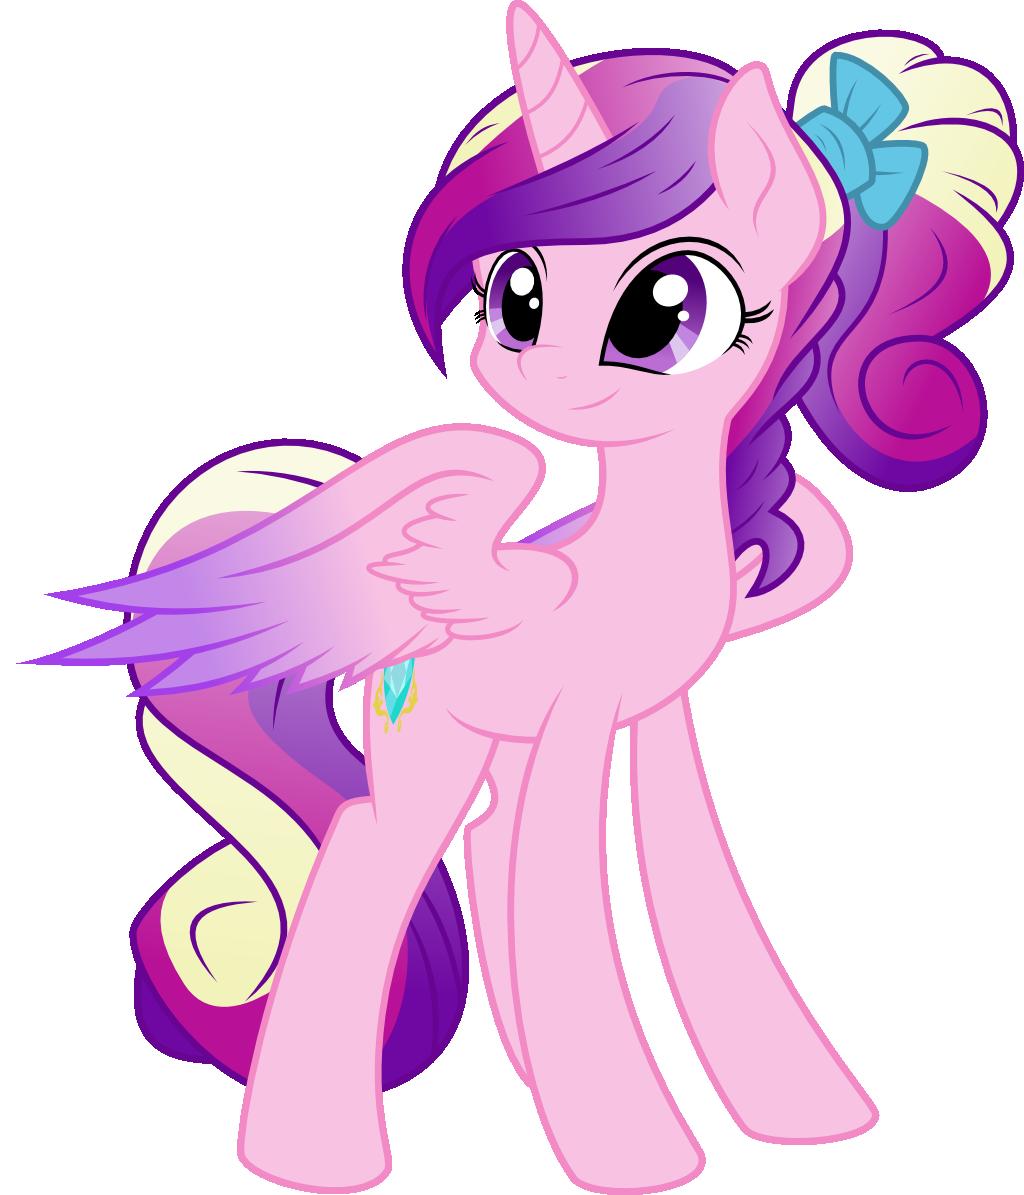 Mlp Hairstyles My Little Pony Princess Little Pony Mlp My Little Pony